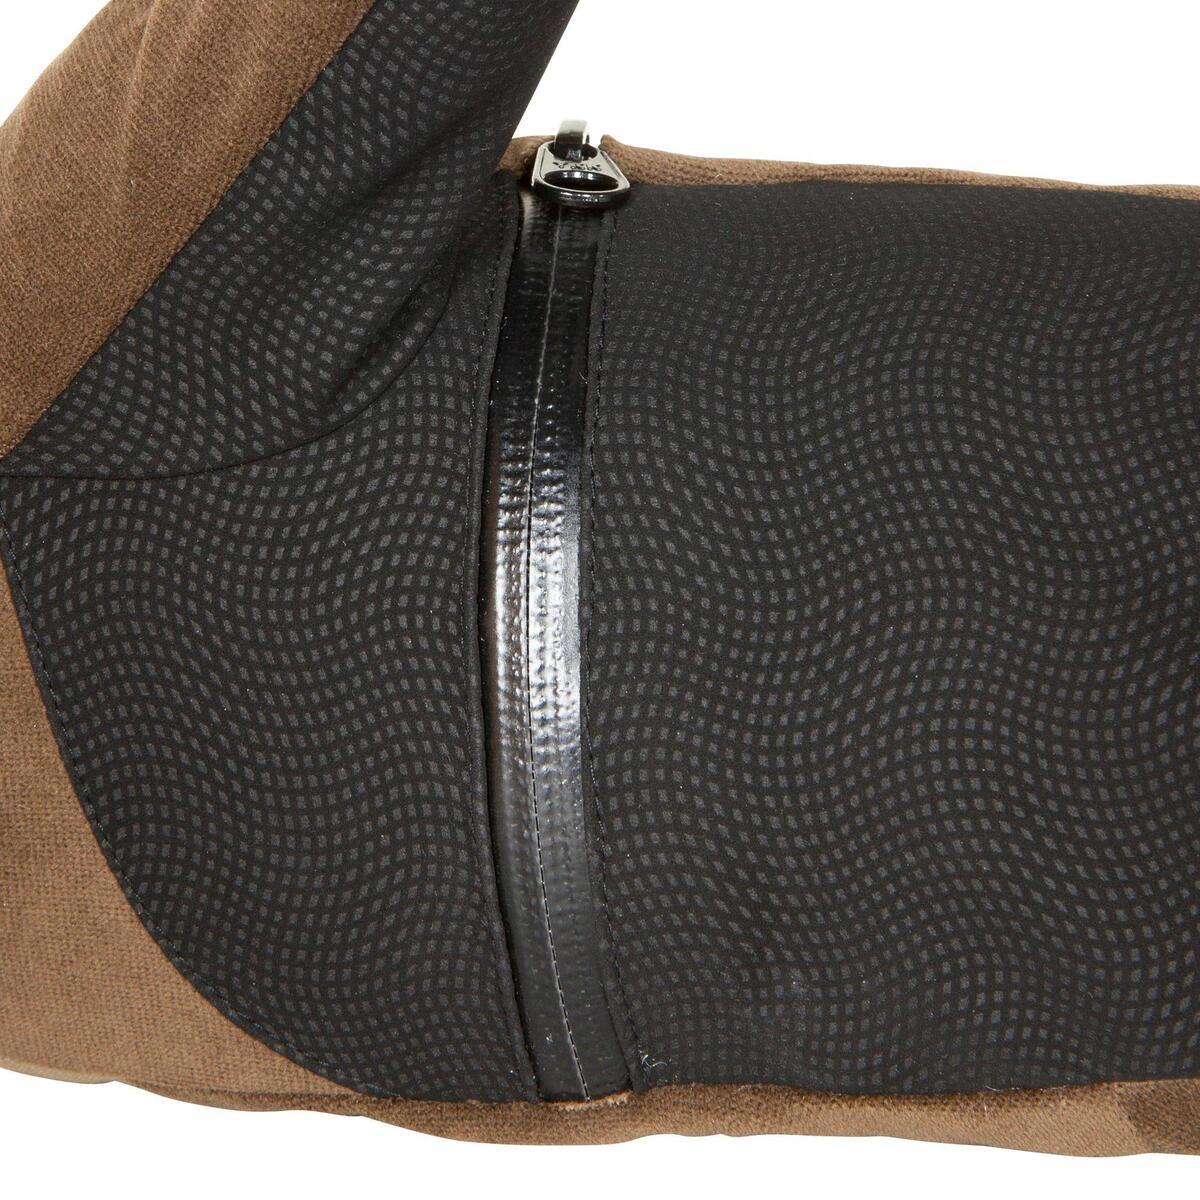 Bild 5 von Jagd-Handschuhe Toundra 500 braun